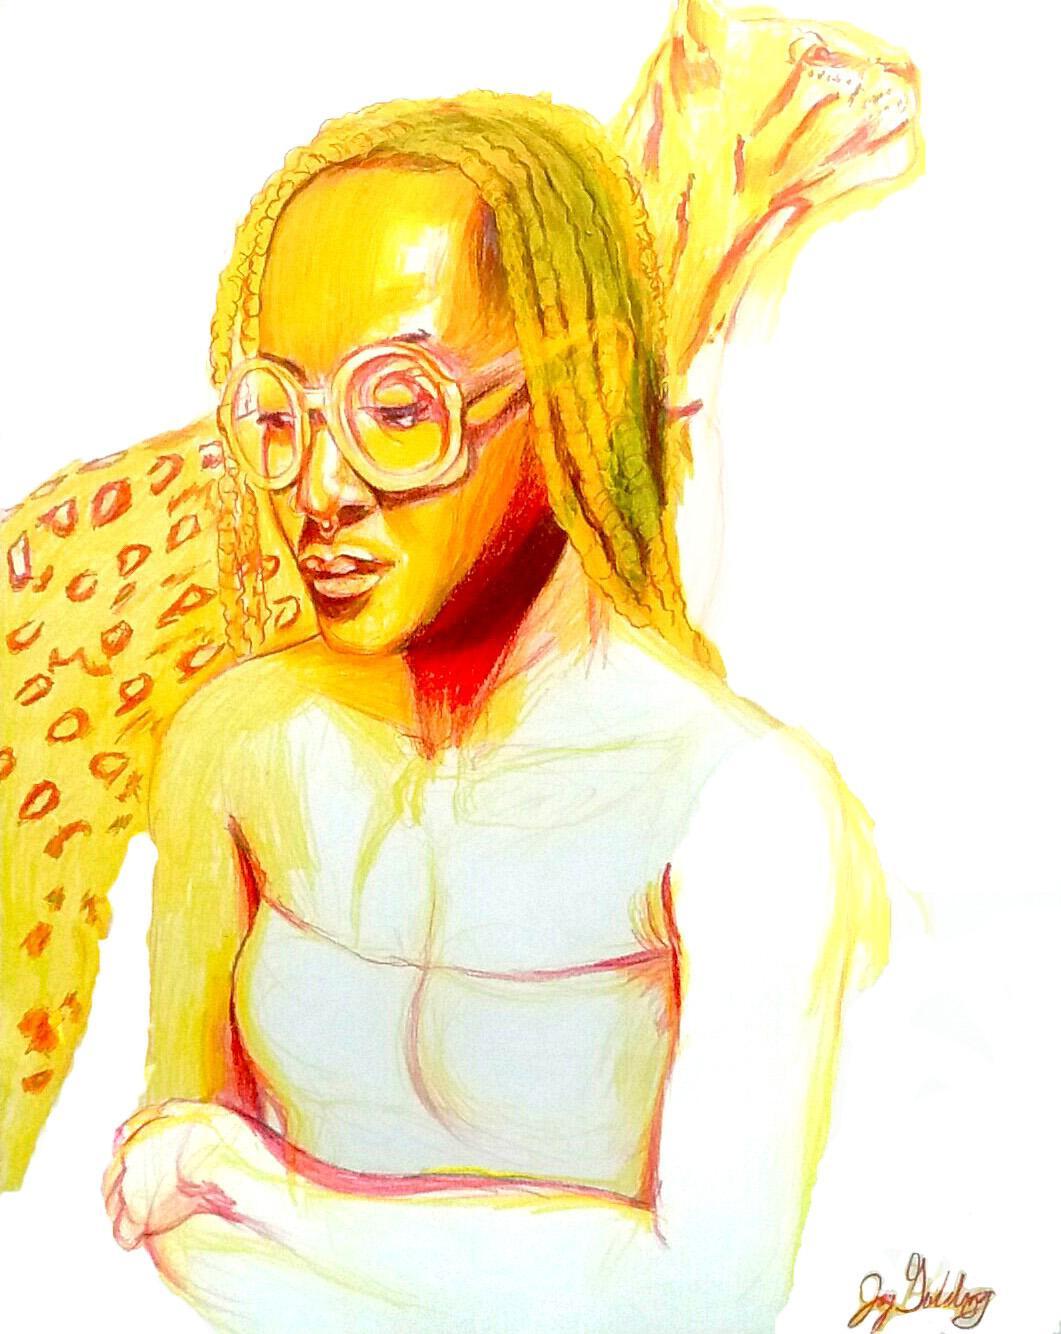 Fire (Ocelot Spirit), 2017, figurative, yellow, orange, drawing, tribal, MarYah